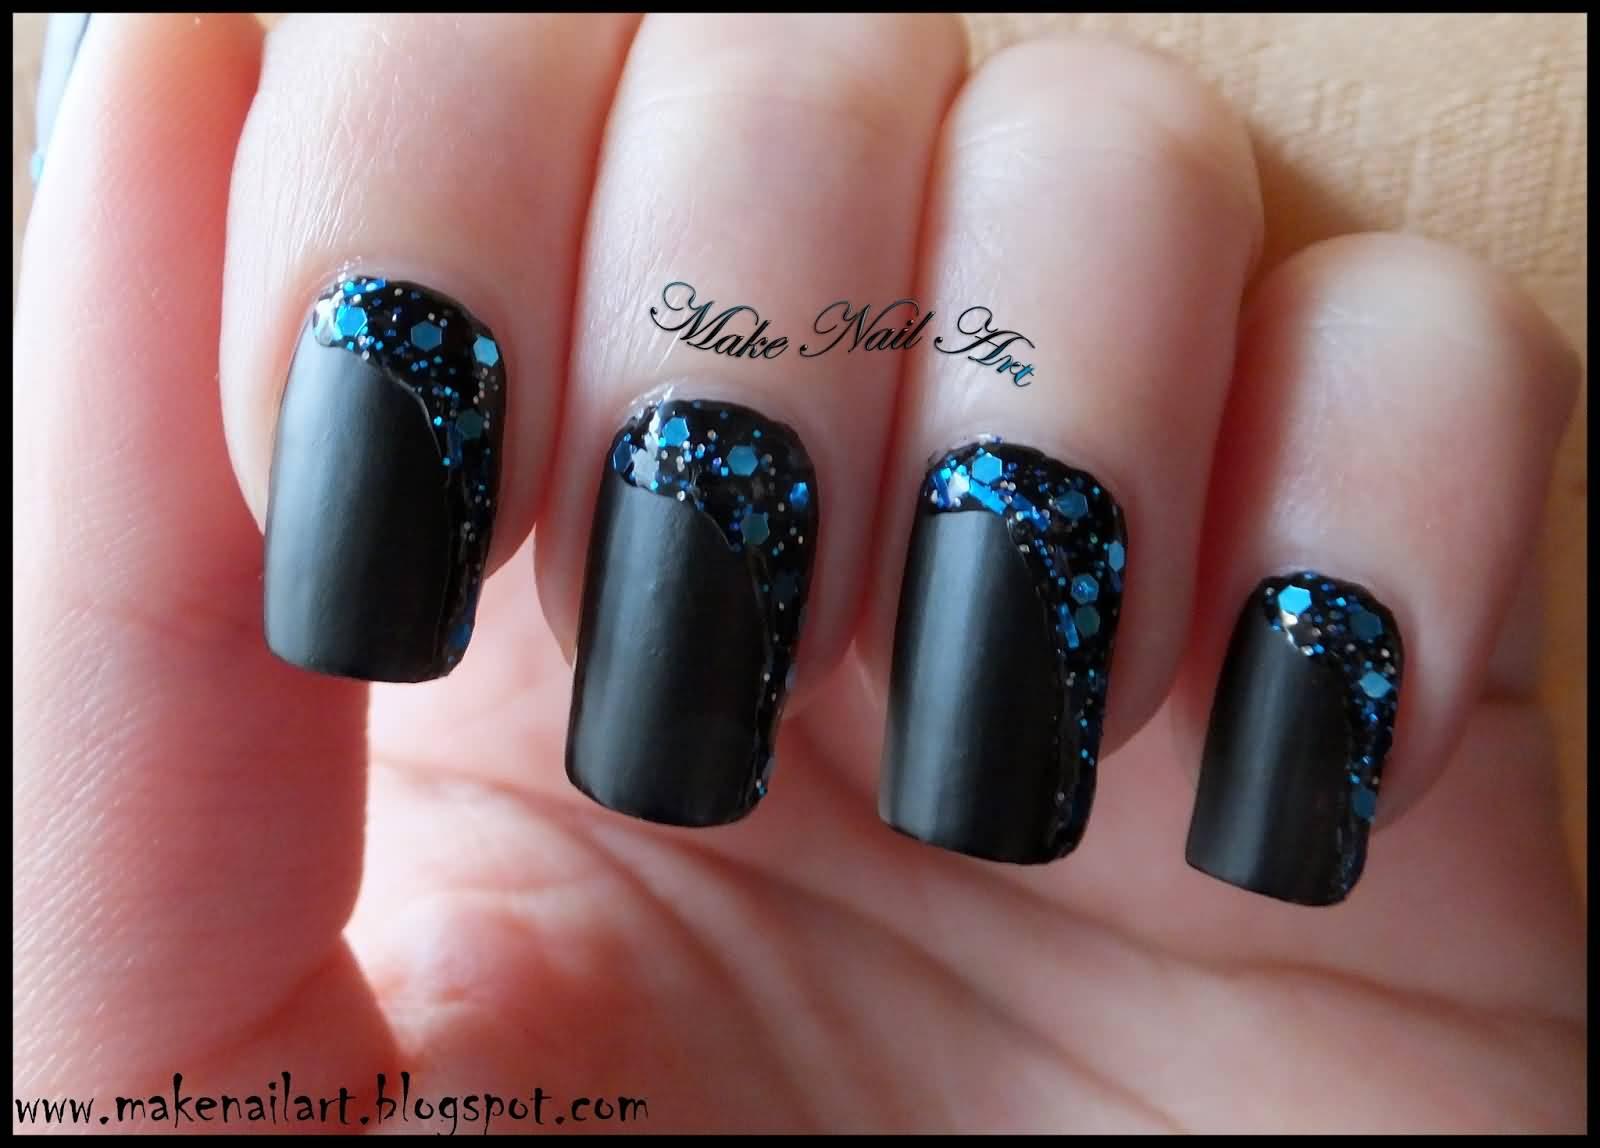 Tremendous Black Matte Nails With Blue Crystal Design